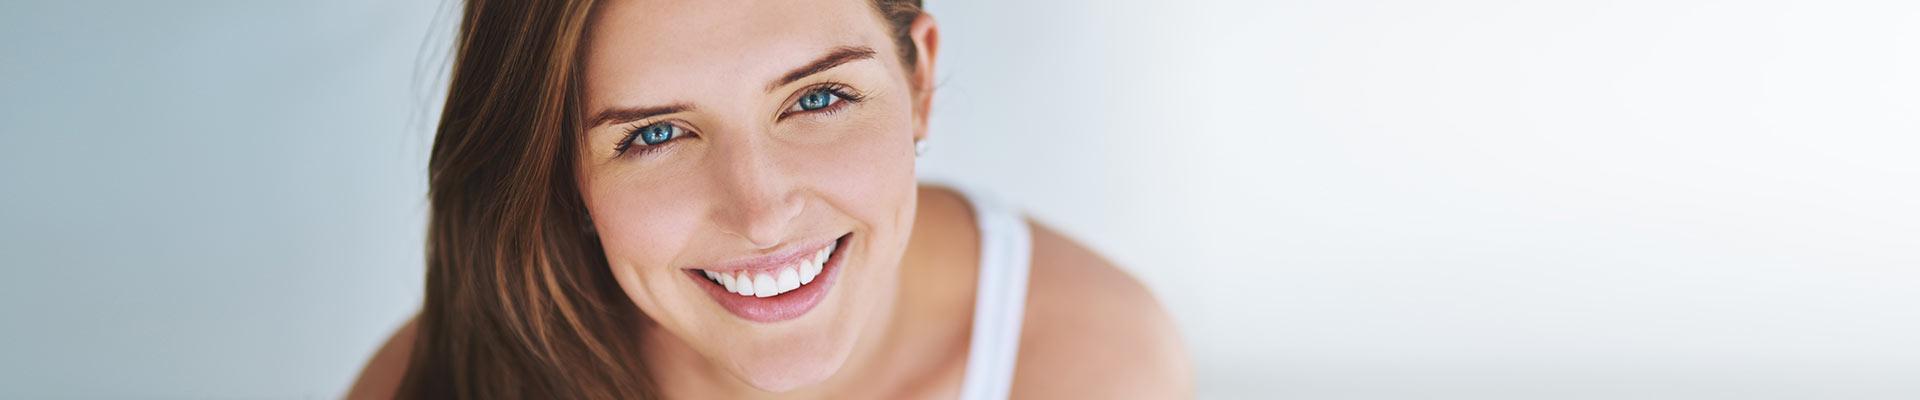 Women Finger Lakes Orthodontics Horseheads Corning, NY